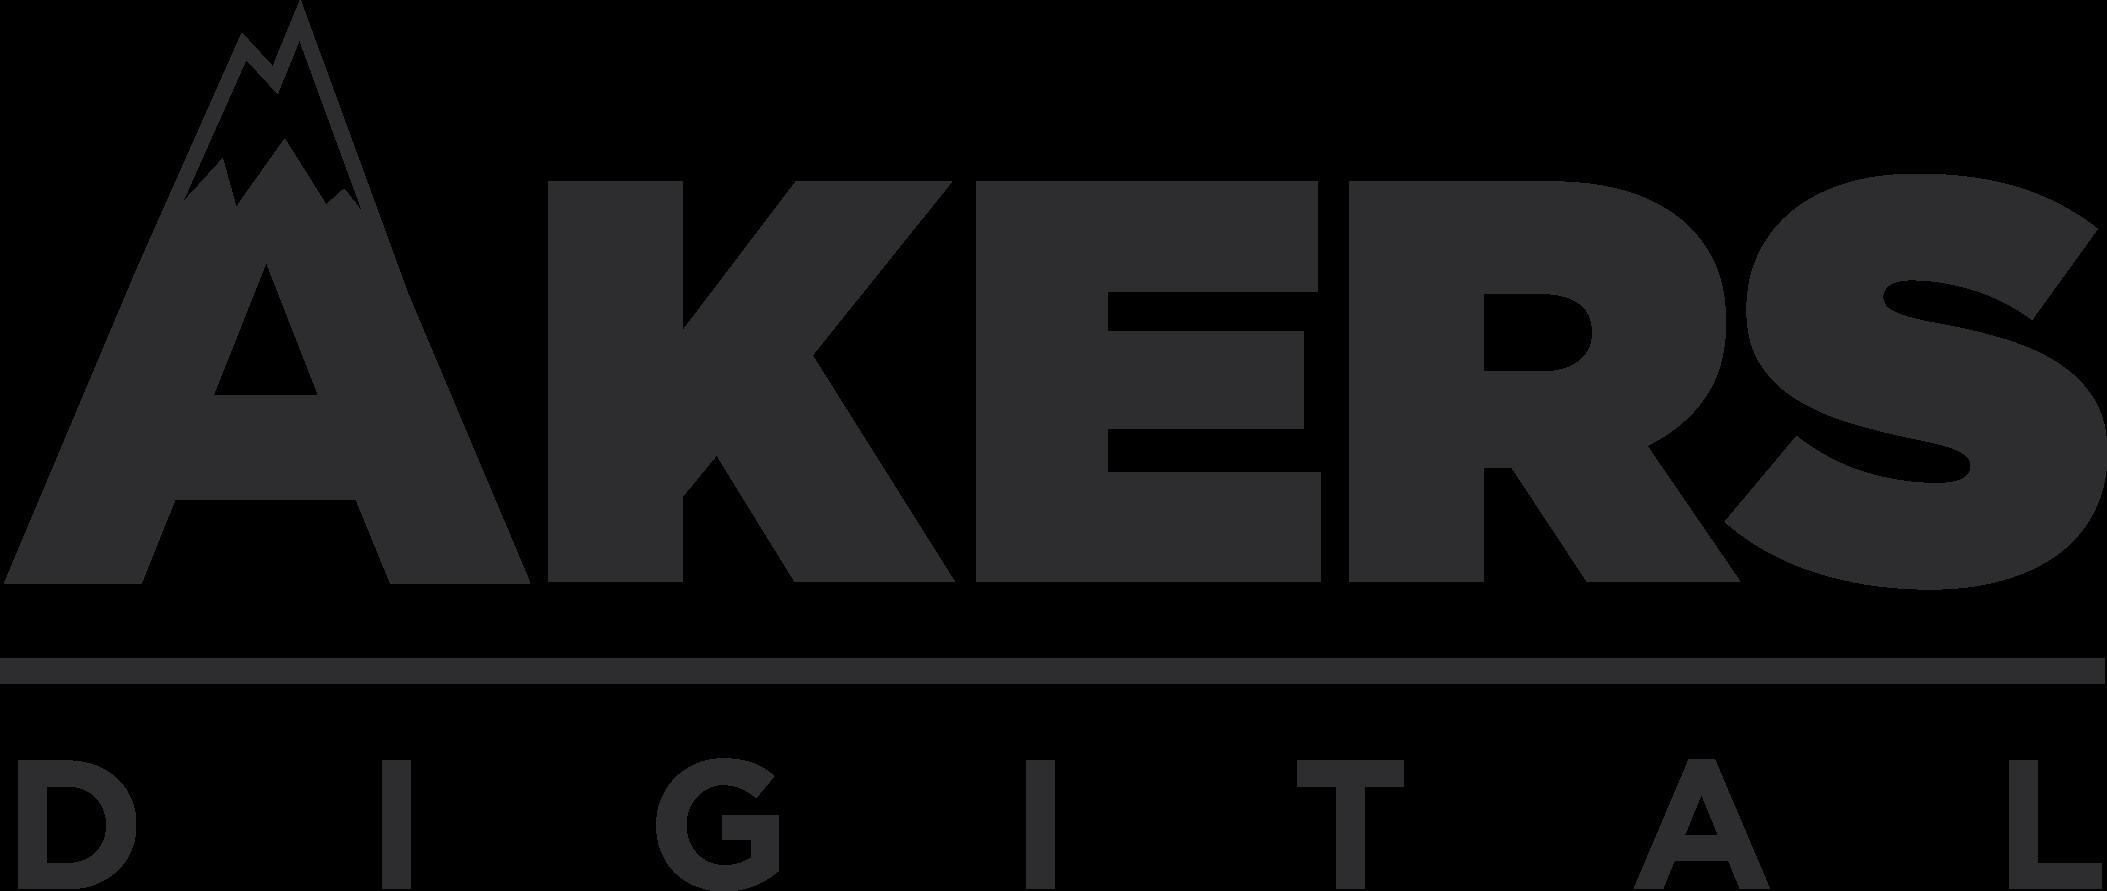 Akers Digital